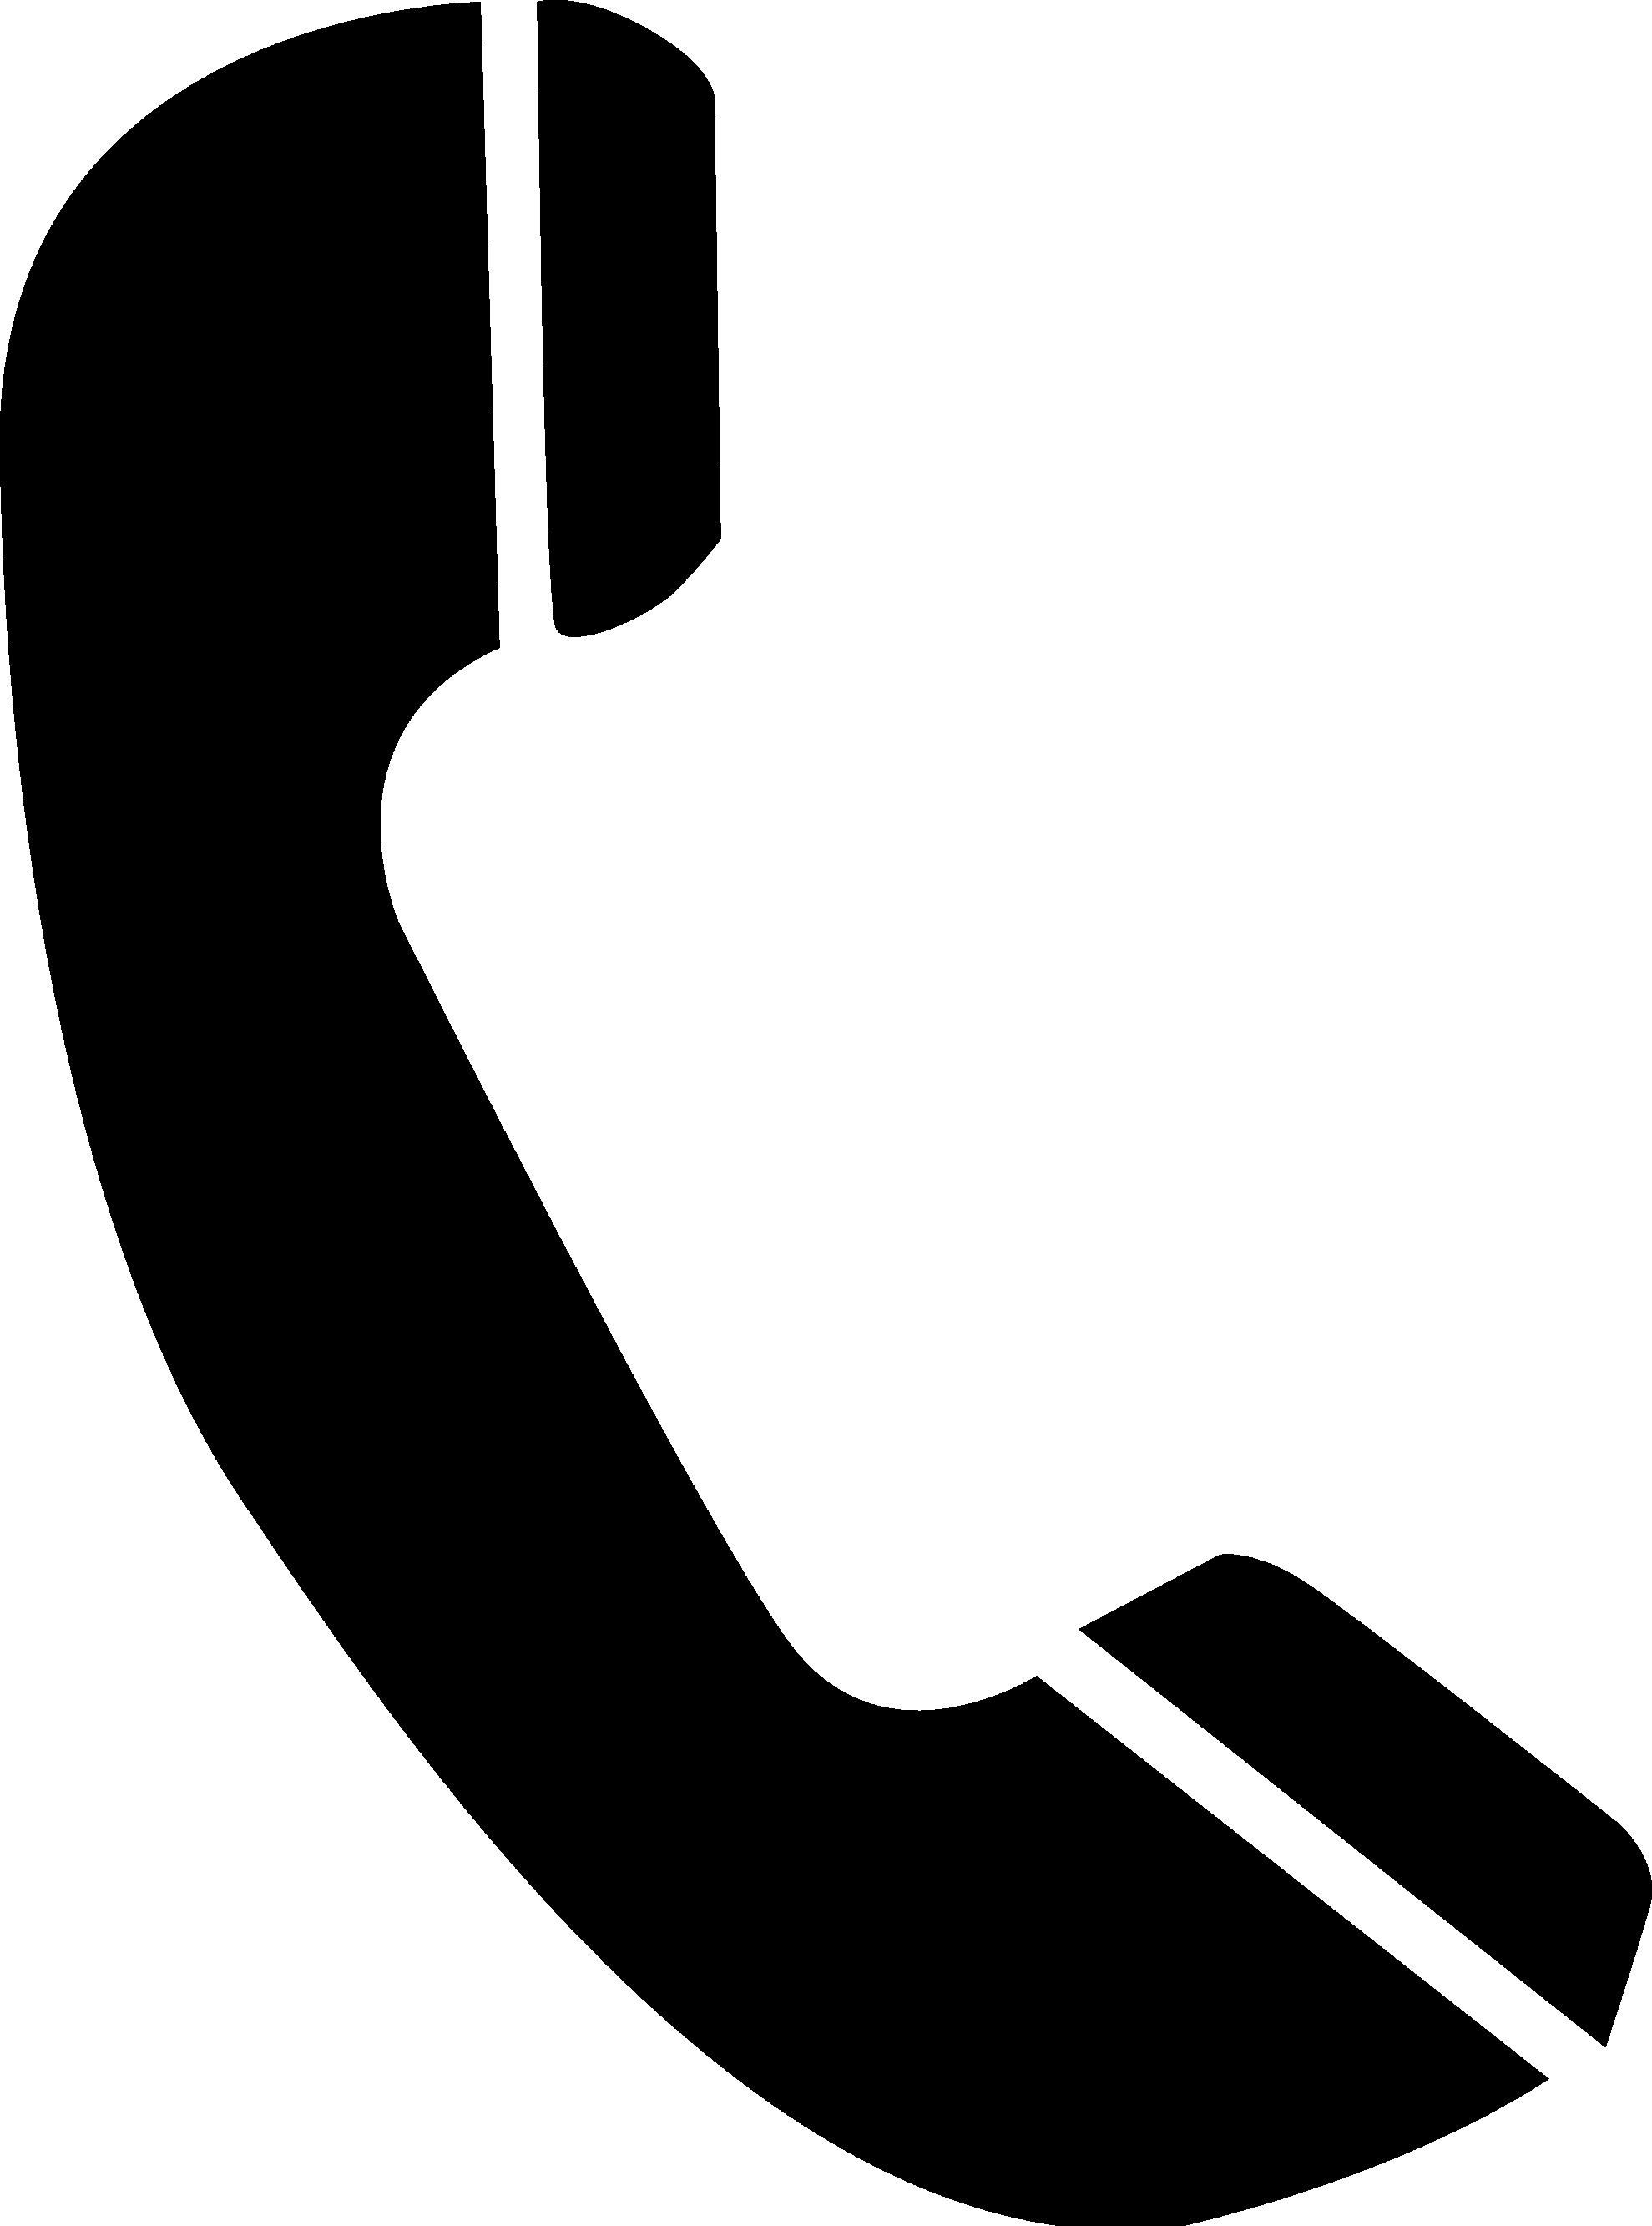 Logo Telephone Png.